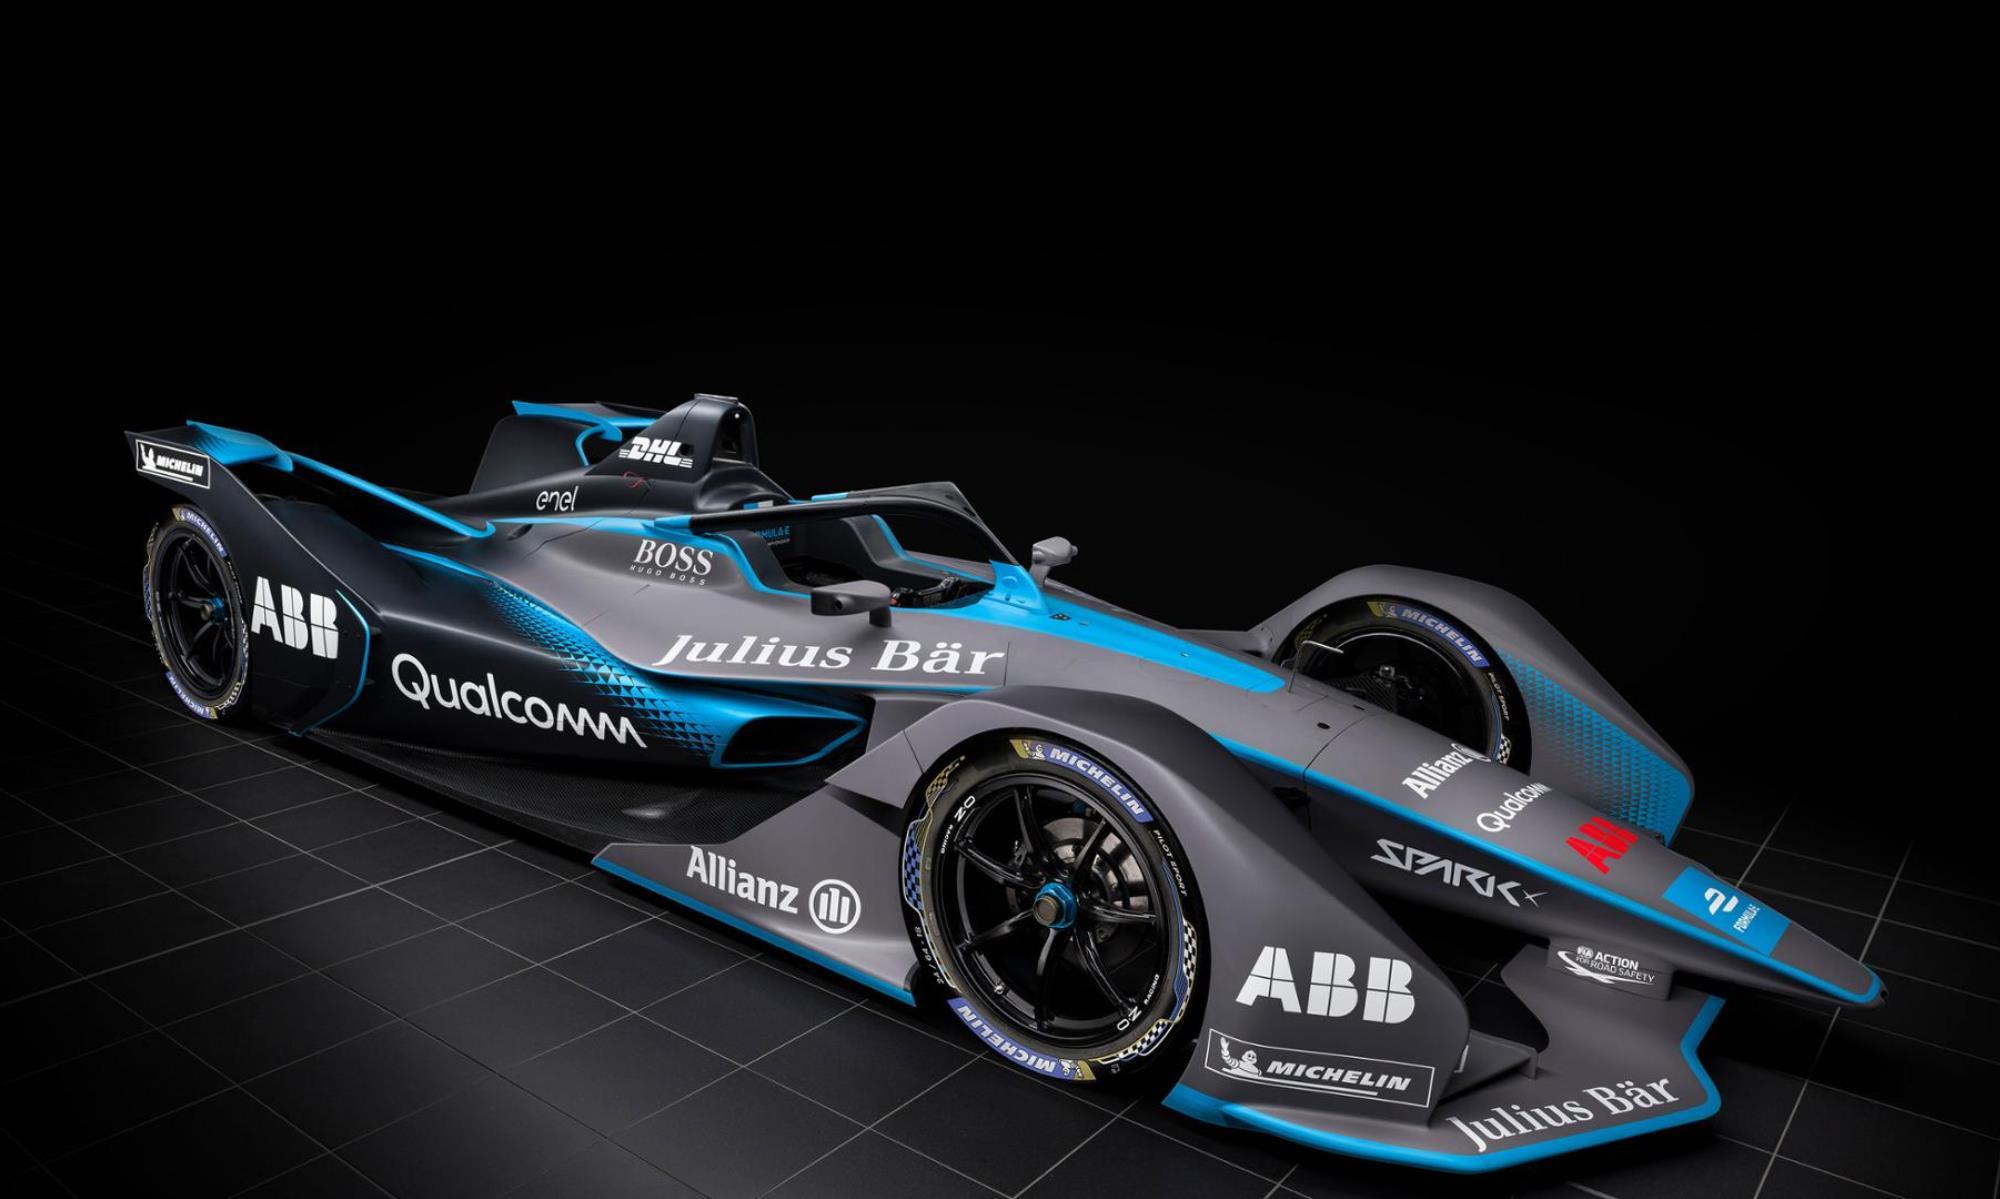 2018/19 Formula E car